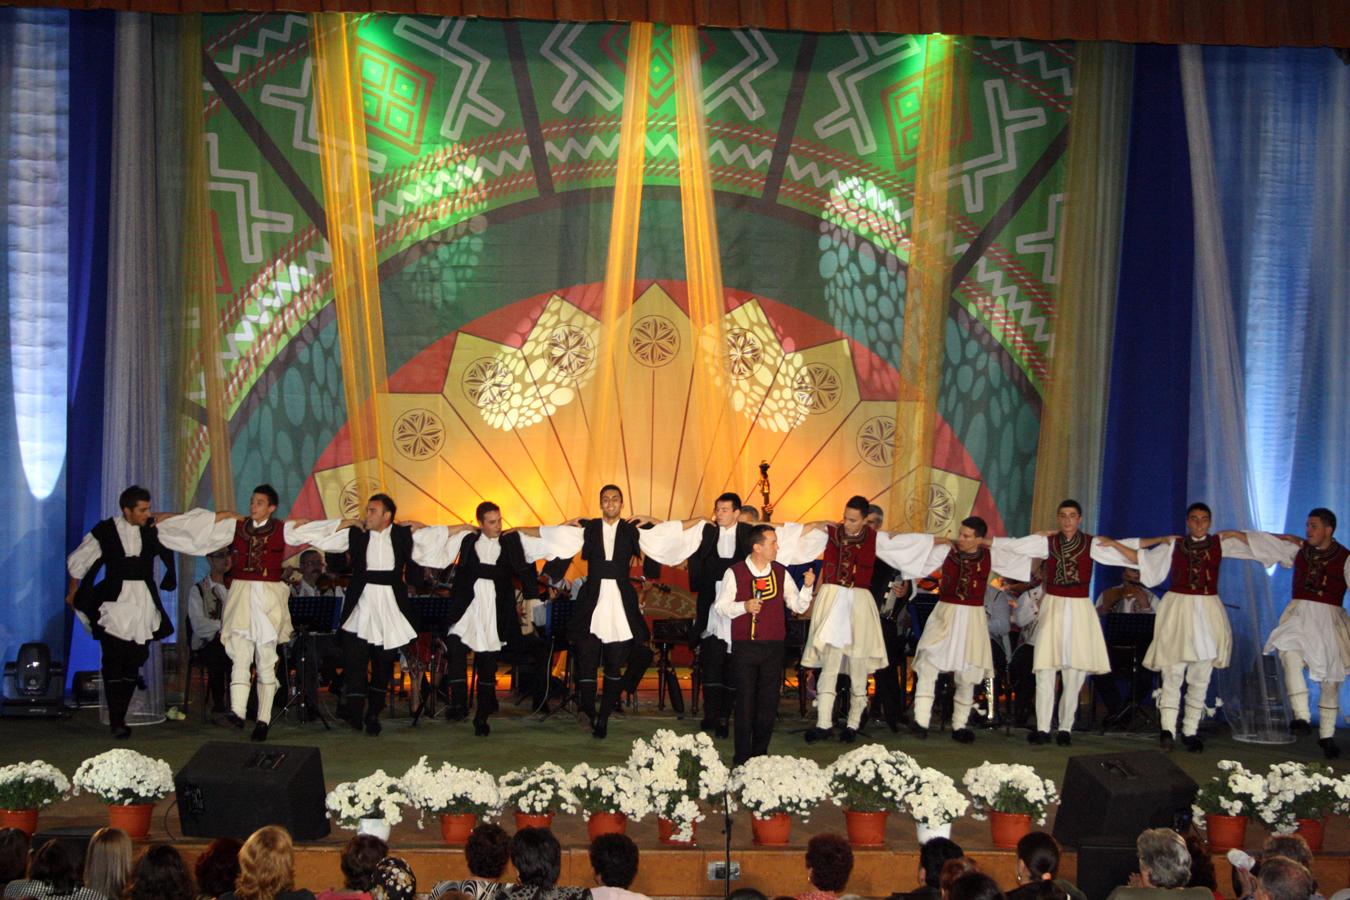 Gica Coada si ansamblul \'\'Iholu\'\' - Constanta - recital